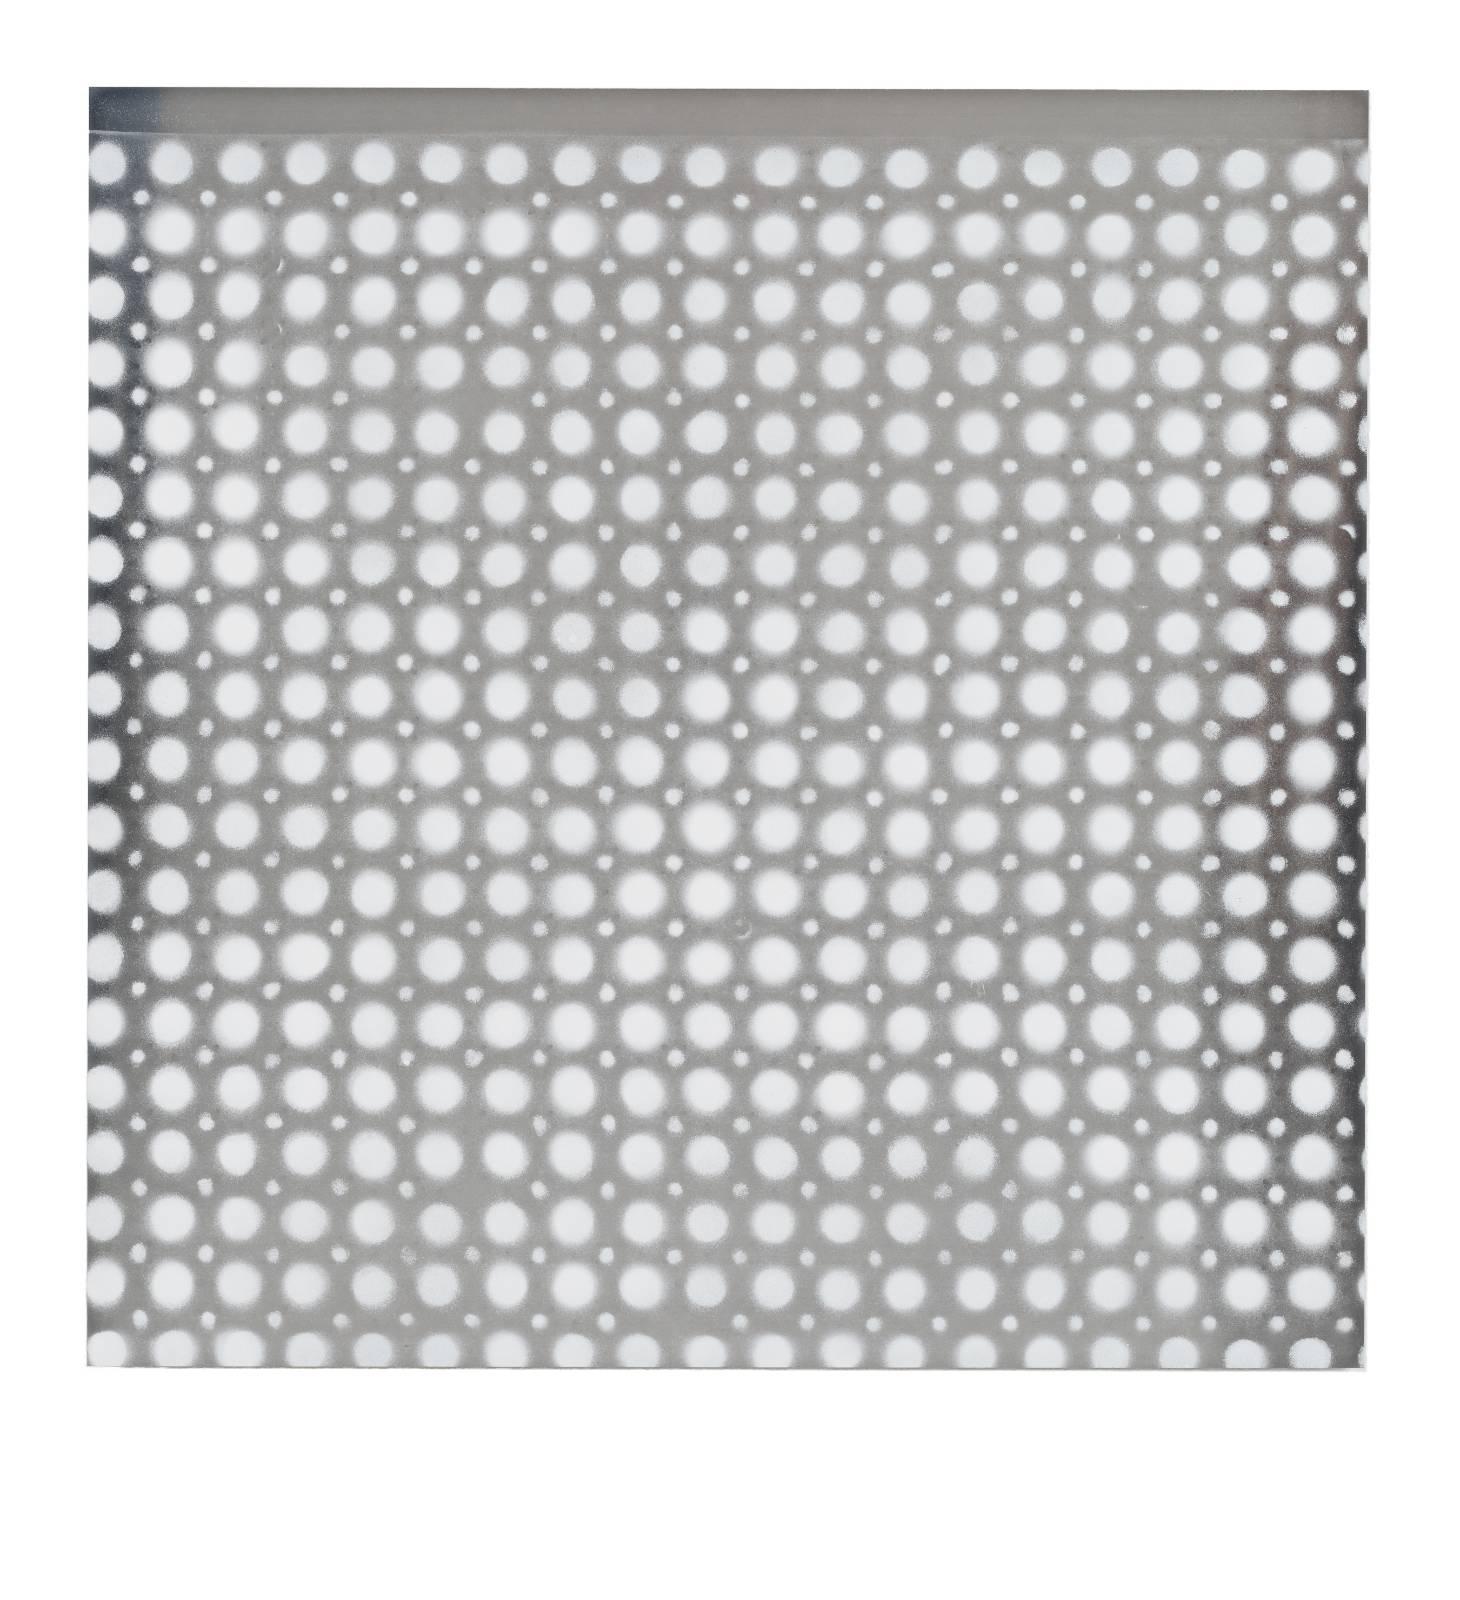 "STAIN : 55°36'31.0""N 13°00'42.4""E, 2016, spraypaint on aluminium, 81,3 x 81,3 cm"